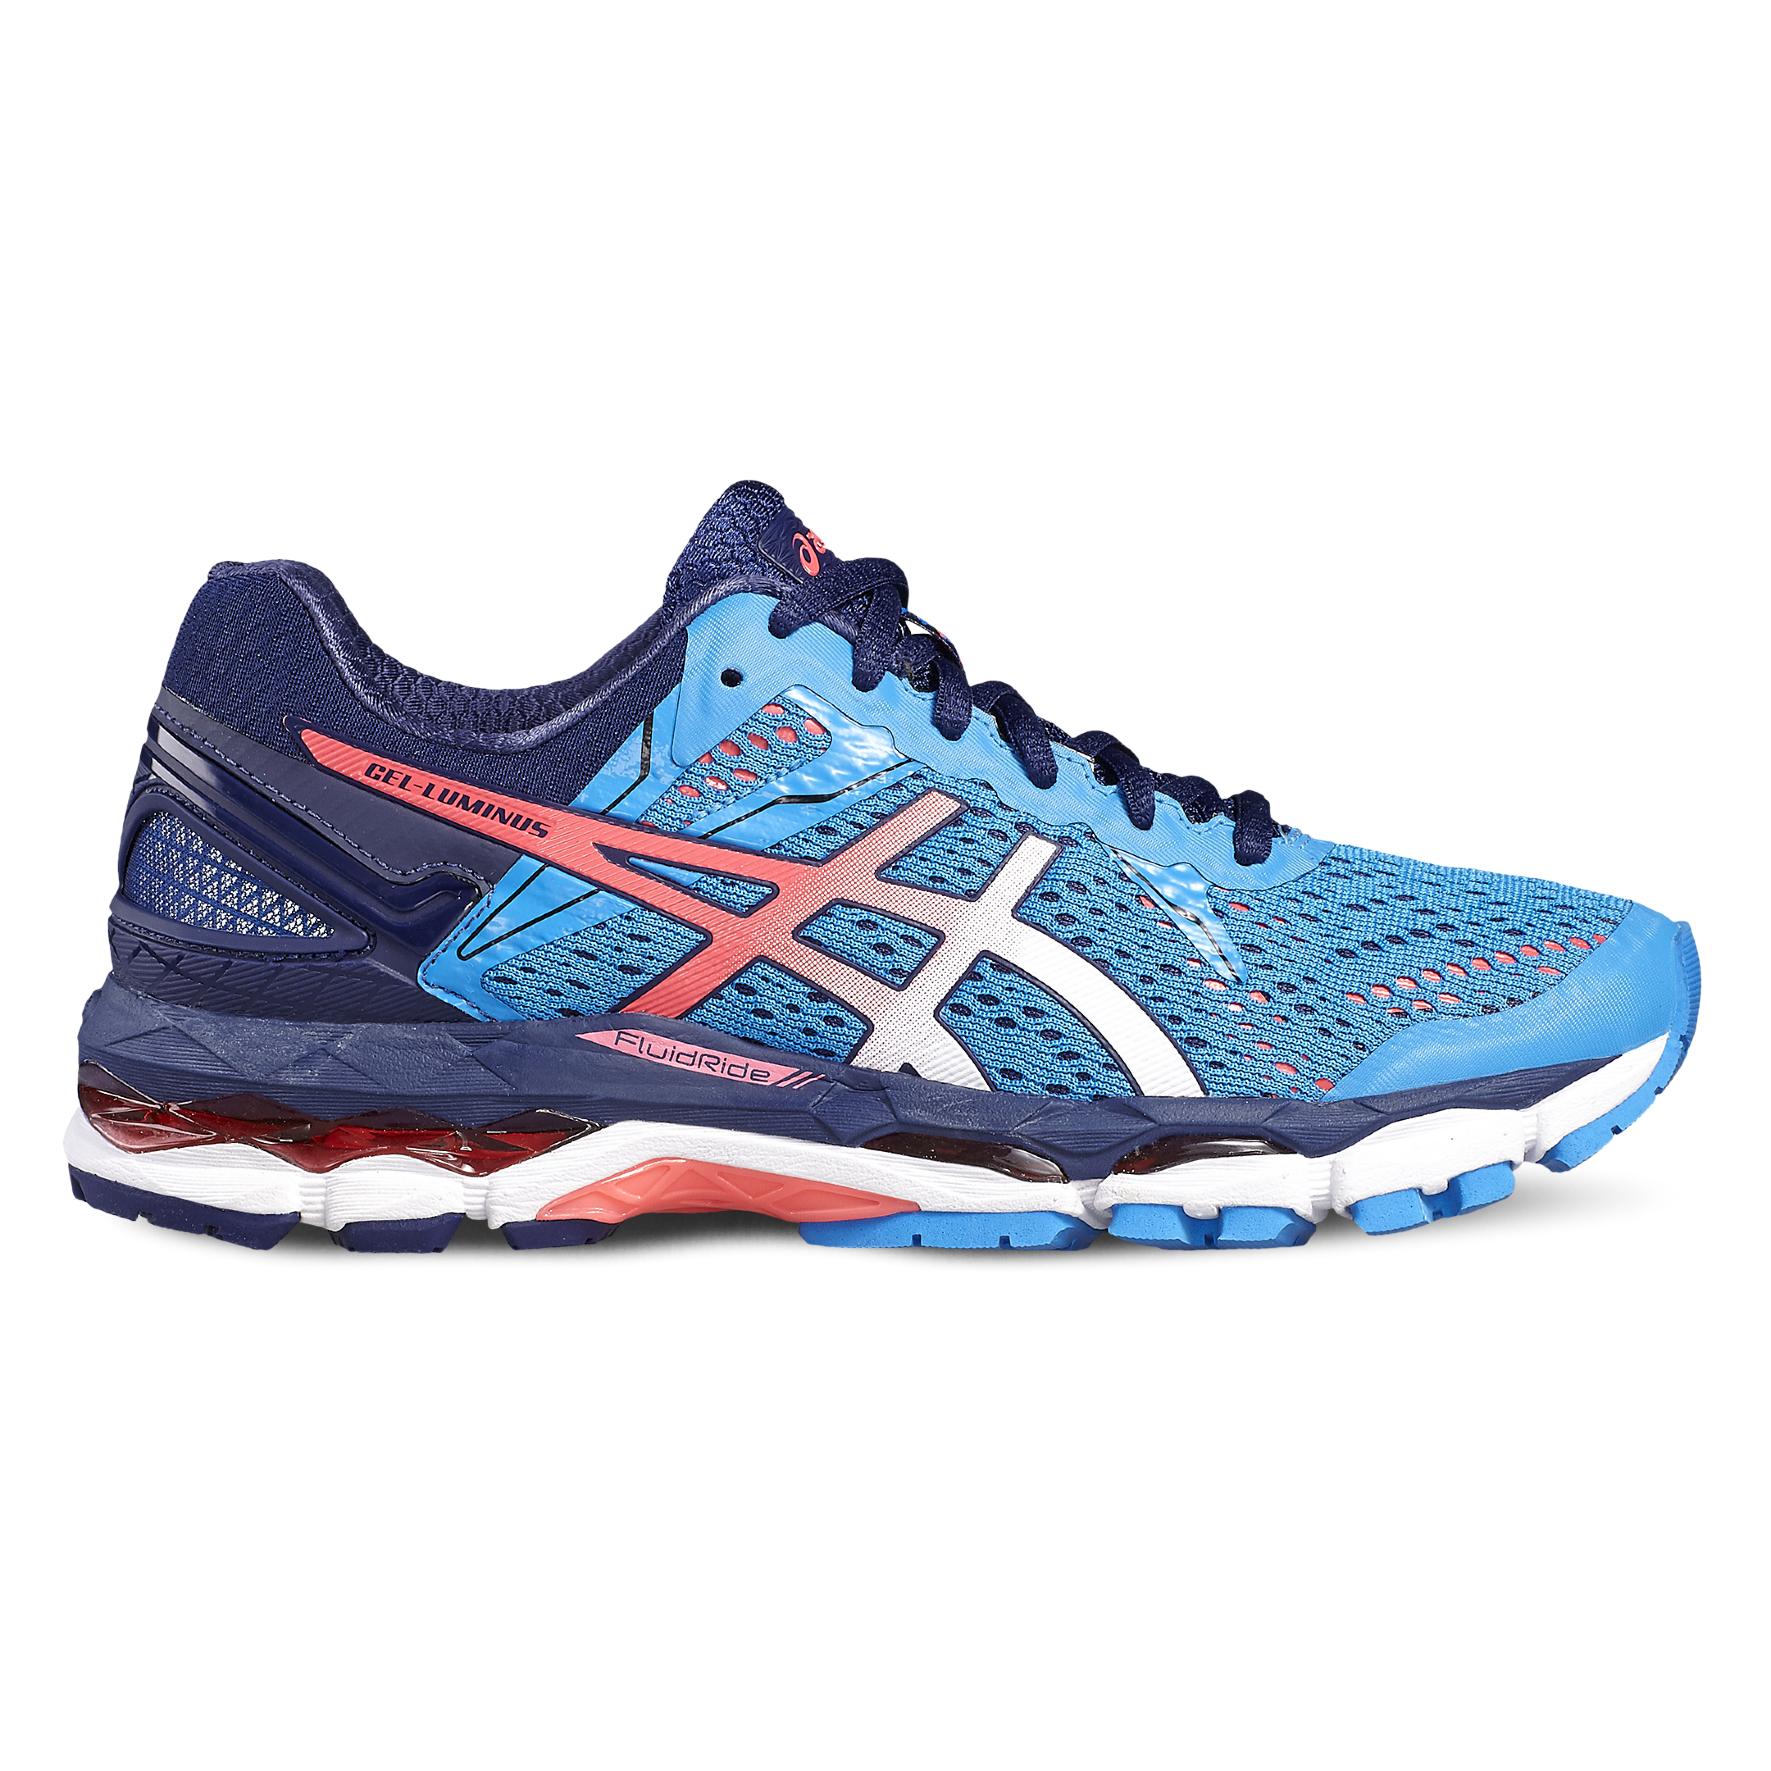 Asics GEL-LUMINUS 2, ženske patike za trčanje, plava